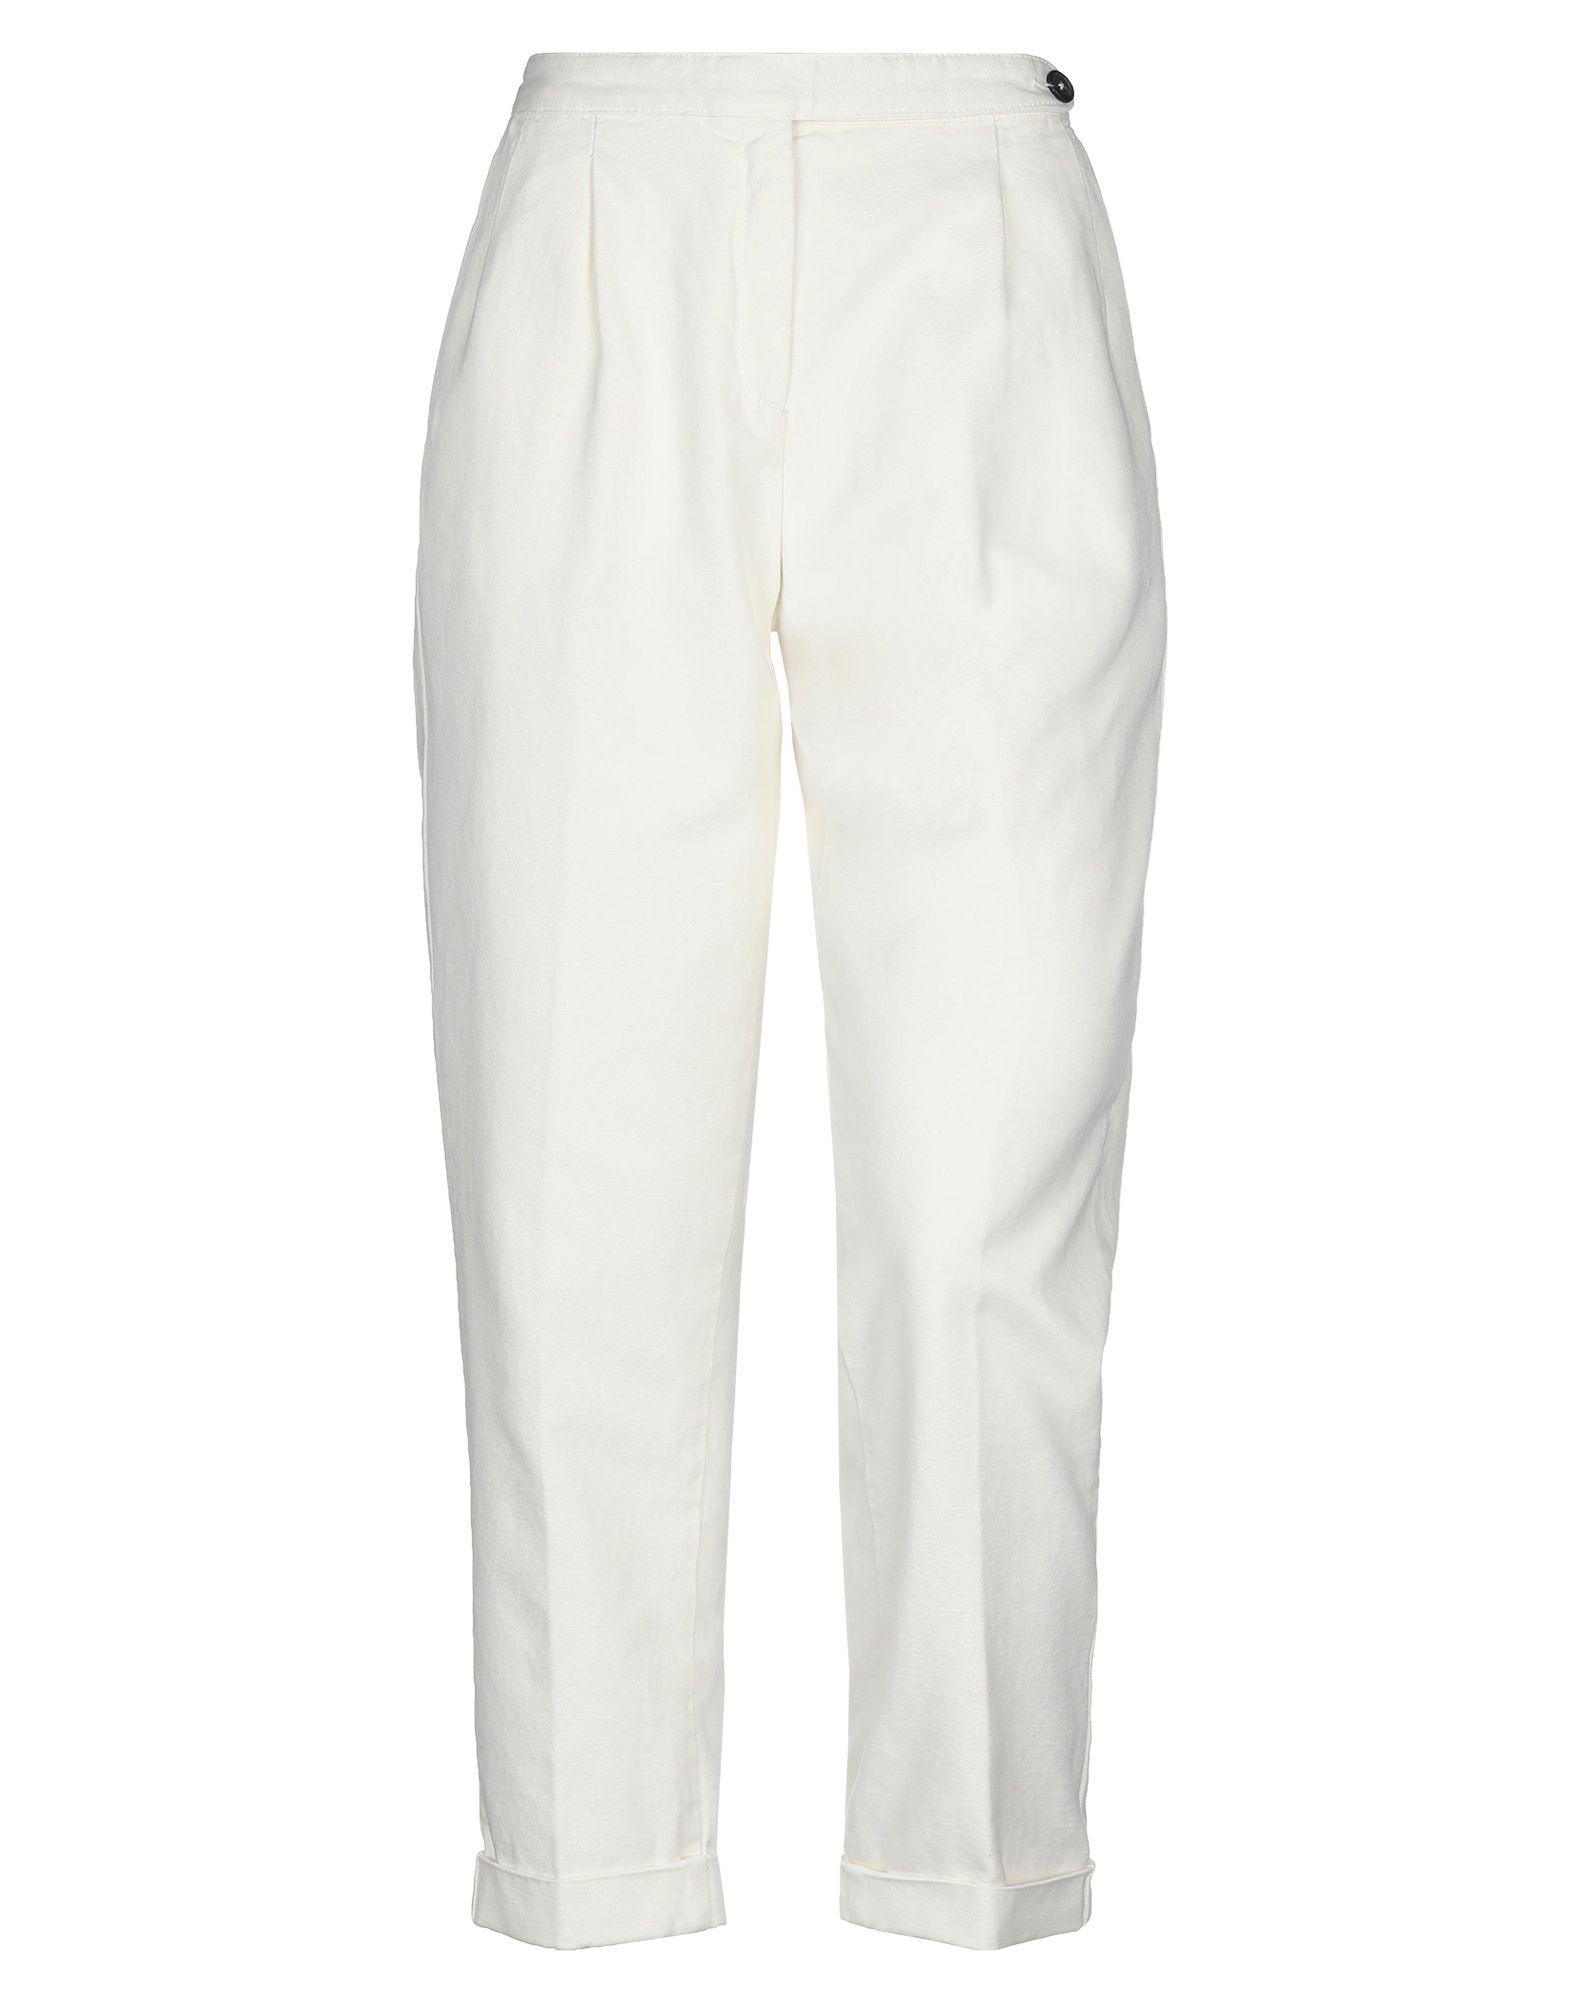 MASSIMO ALBA Повседневные брюки massimo alba платок